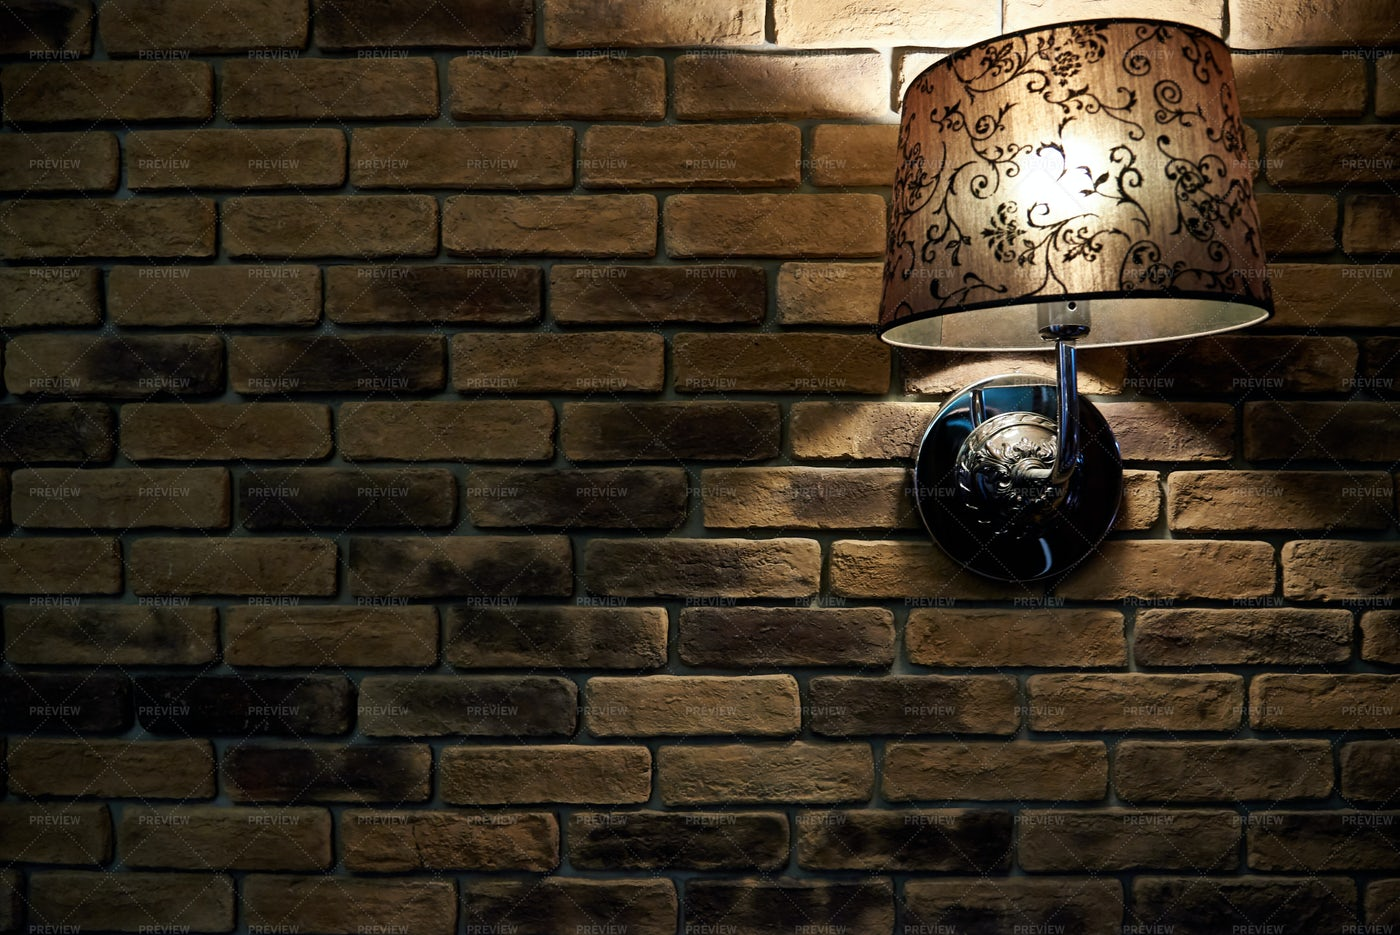 Lamp On Brick Wall: Stock Photos